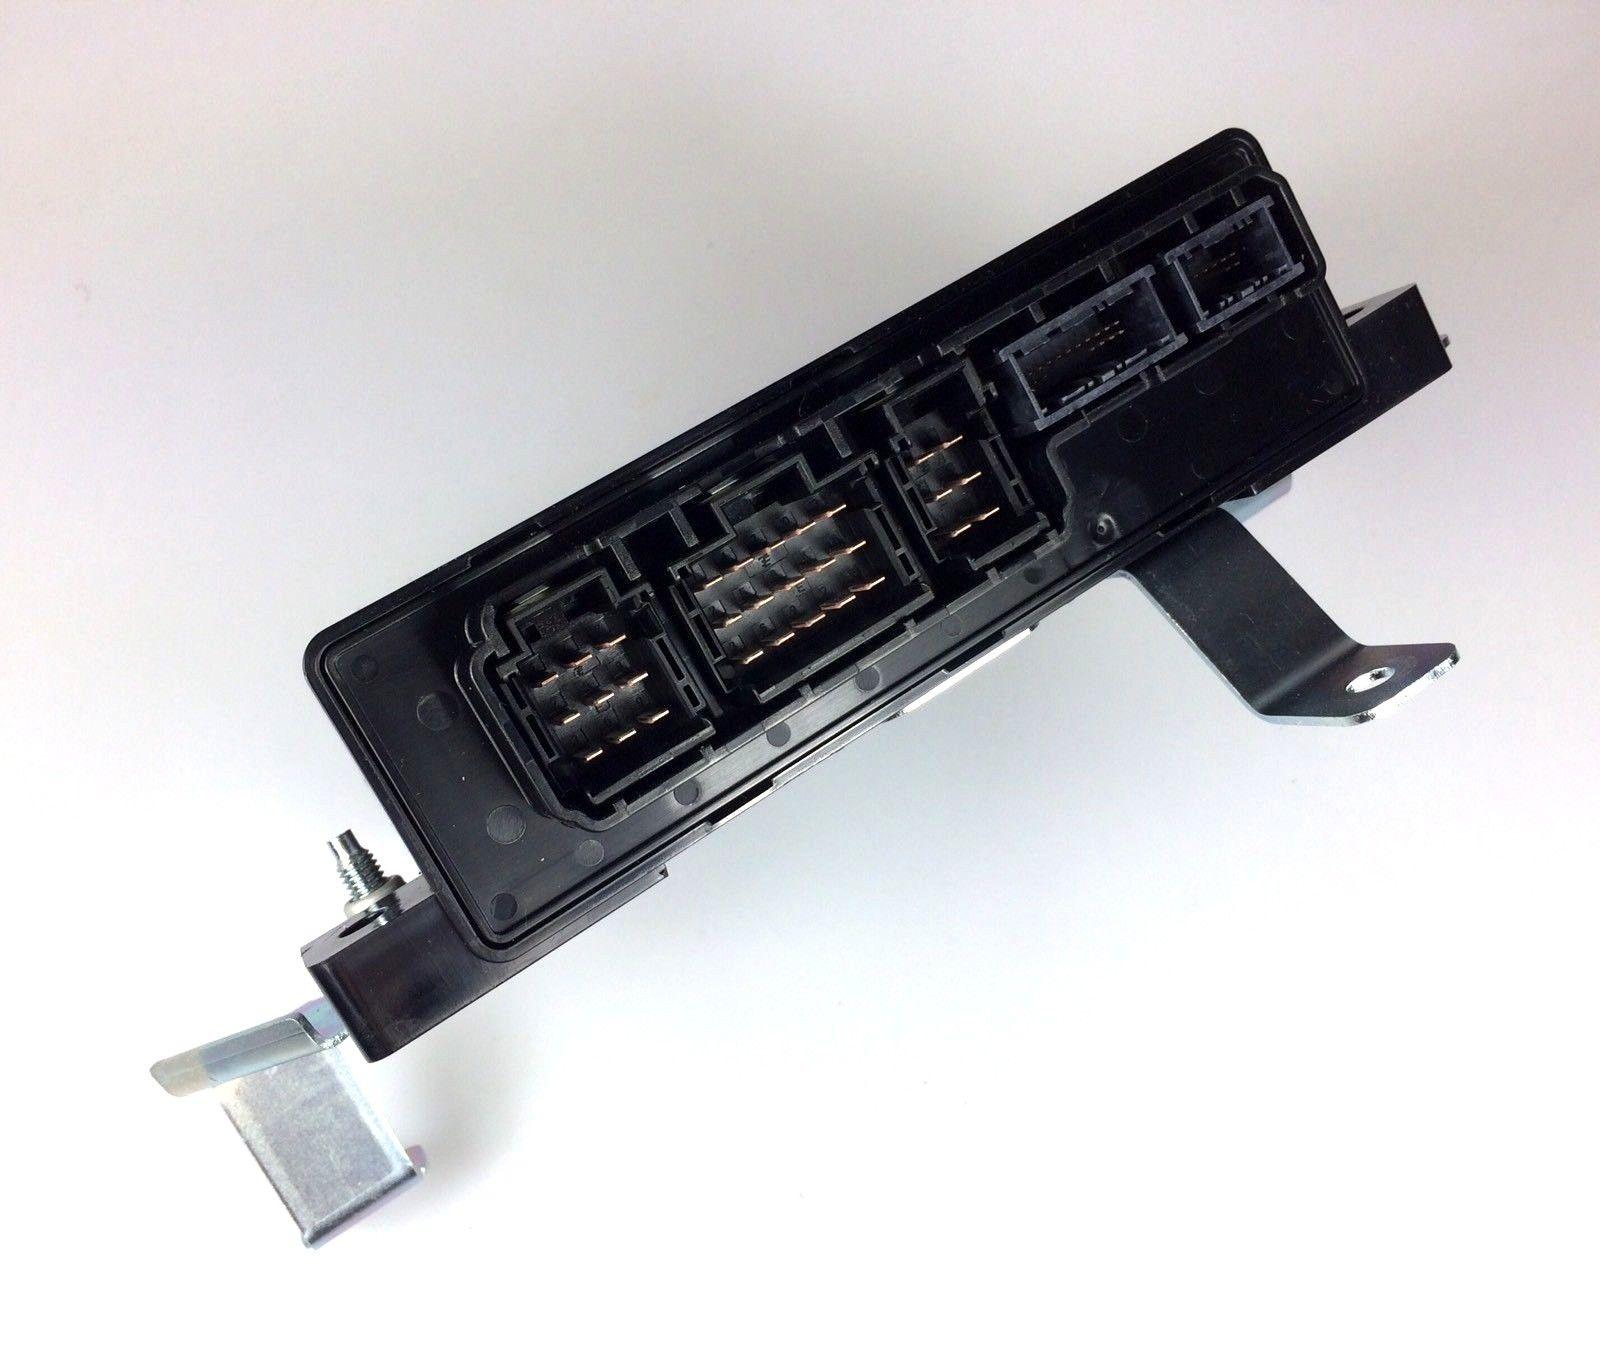 JAGUAR F-PACE DEPLOYABLE SIDE STEP ECU MODULE – T4A16372.